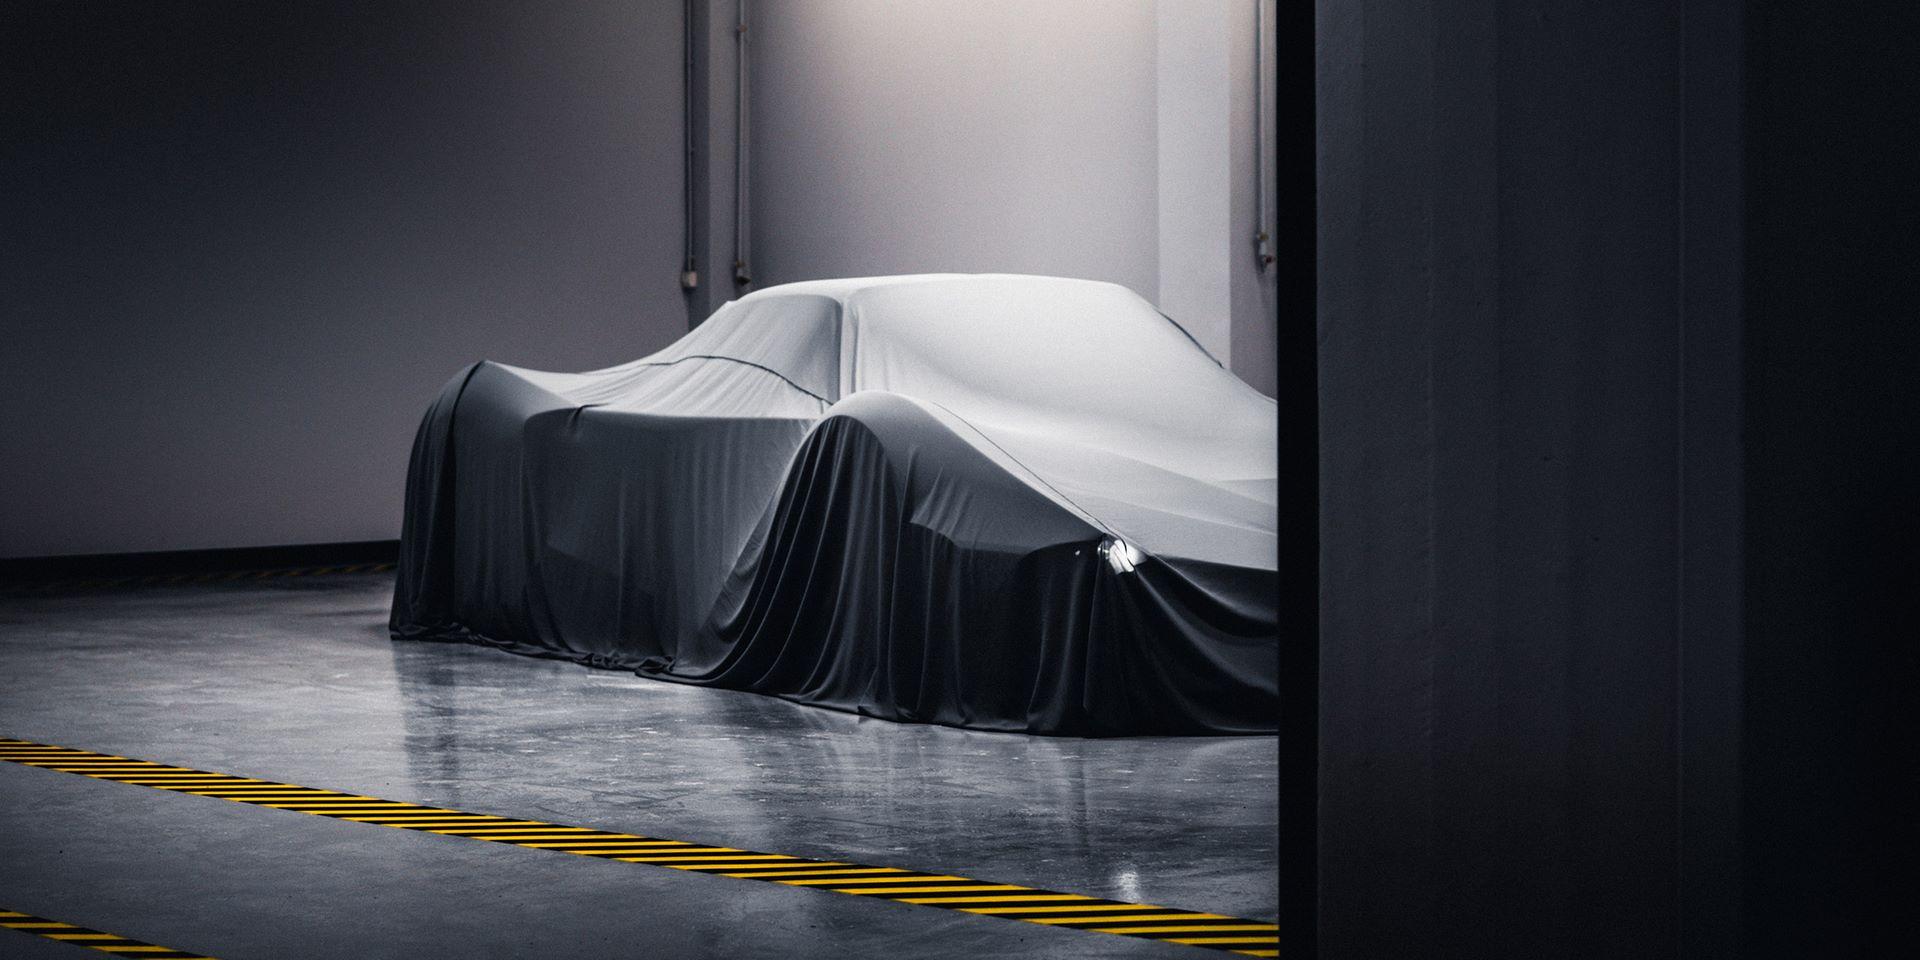 Spyros-Panopoulos-Automotive-Chaos-1